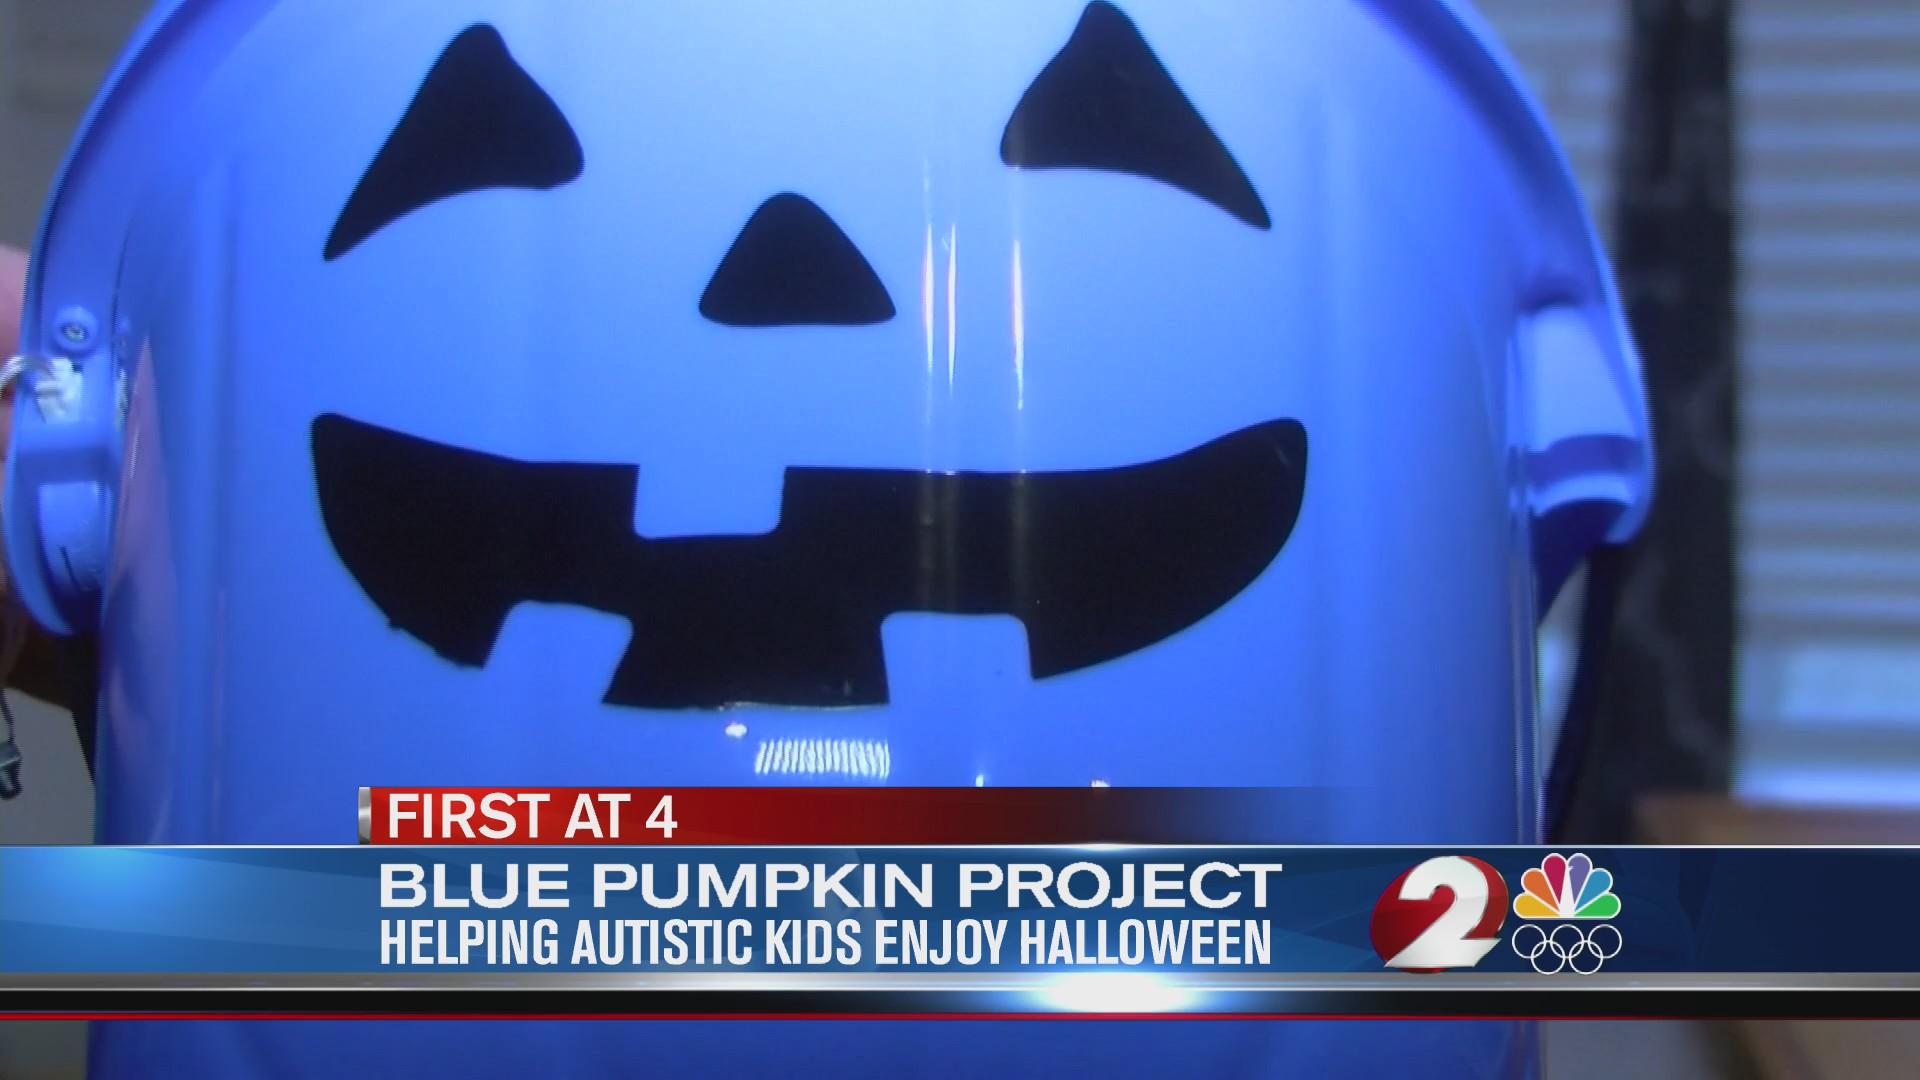 Blue pumpkin project